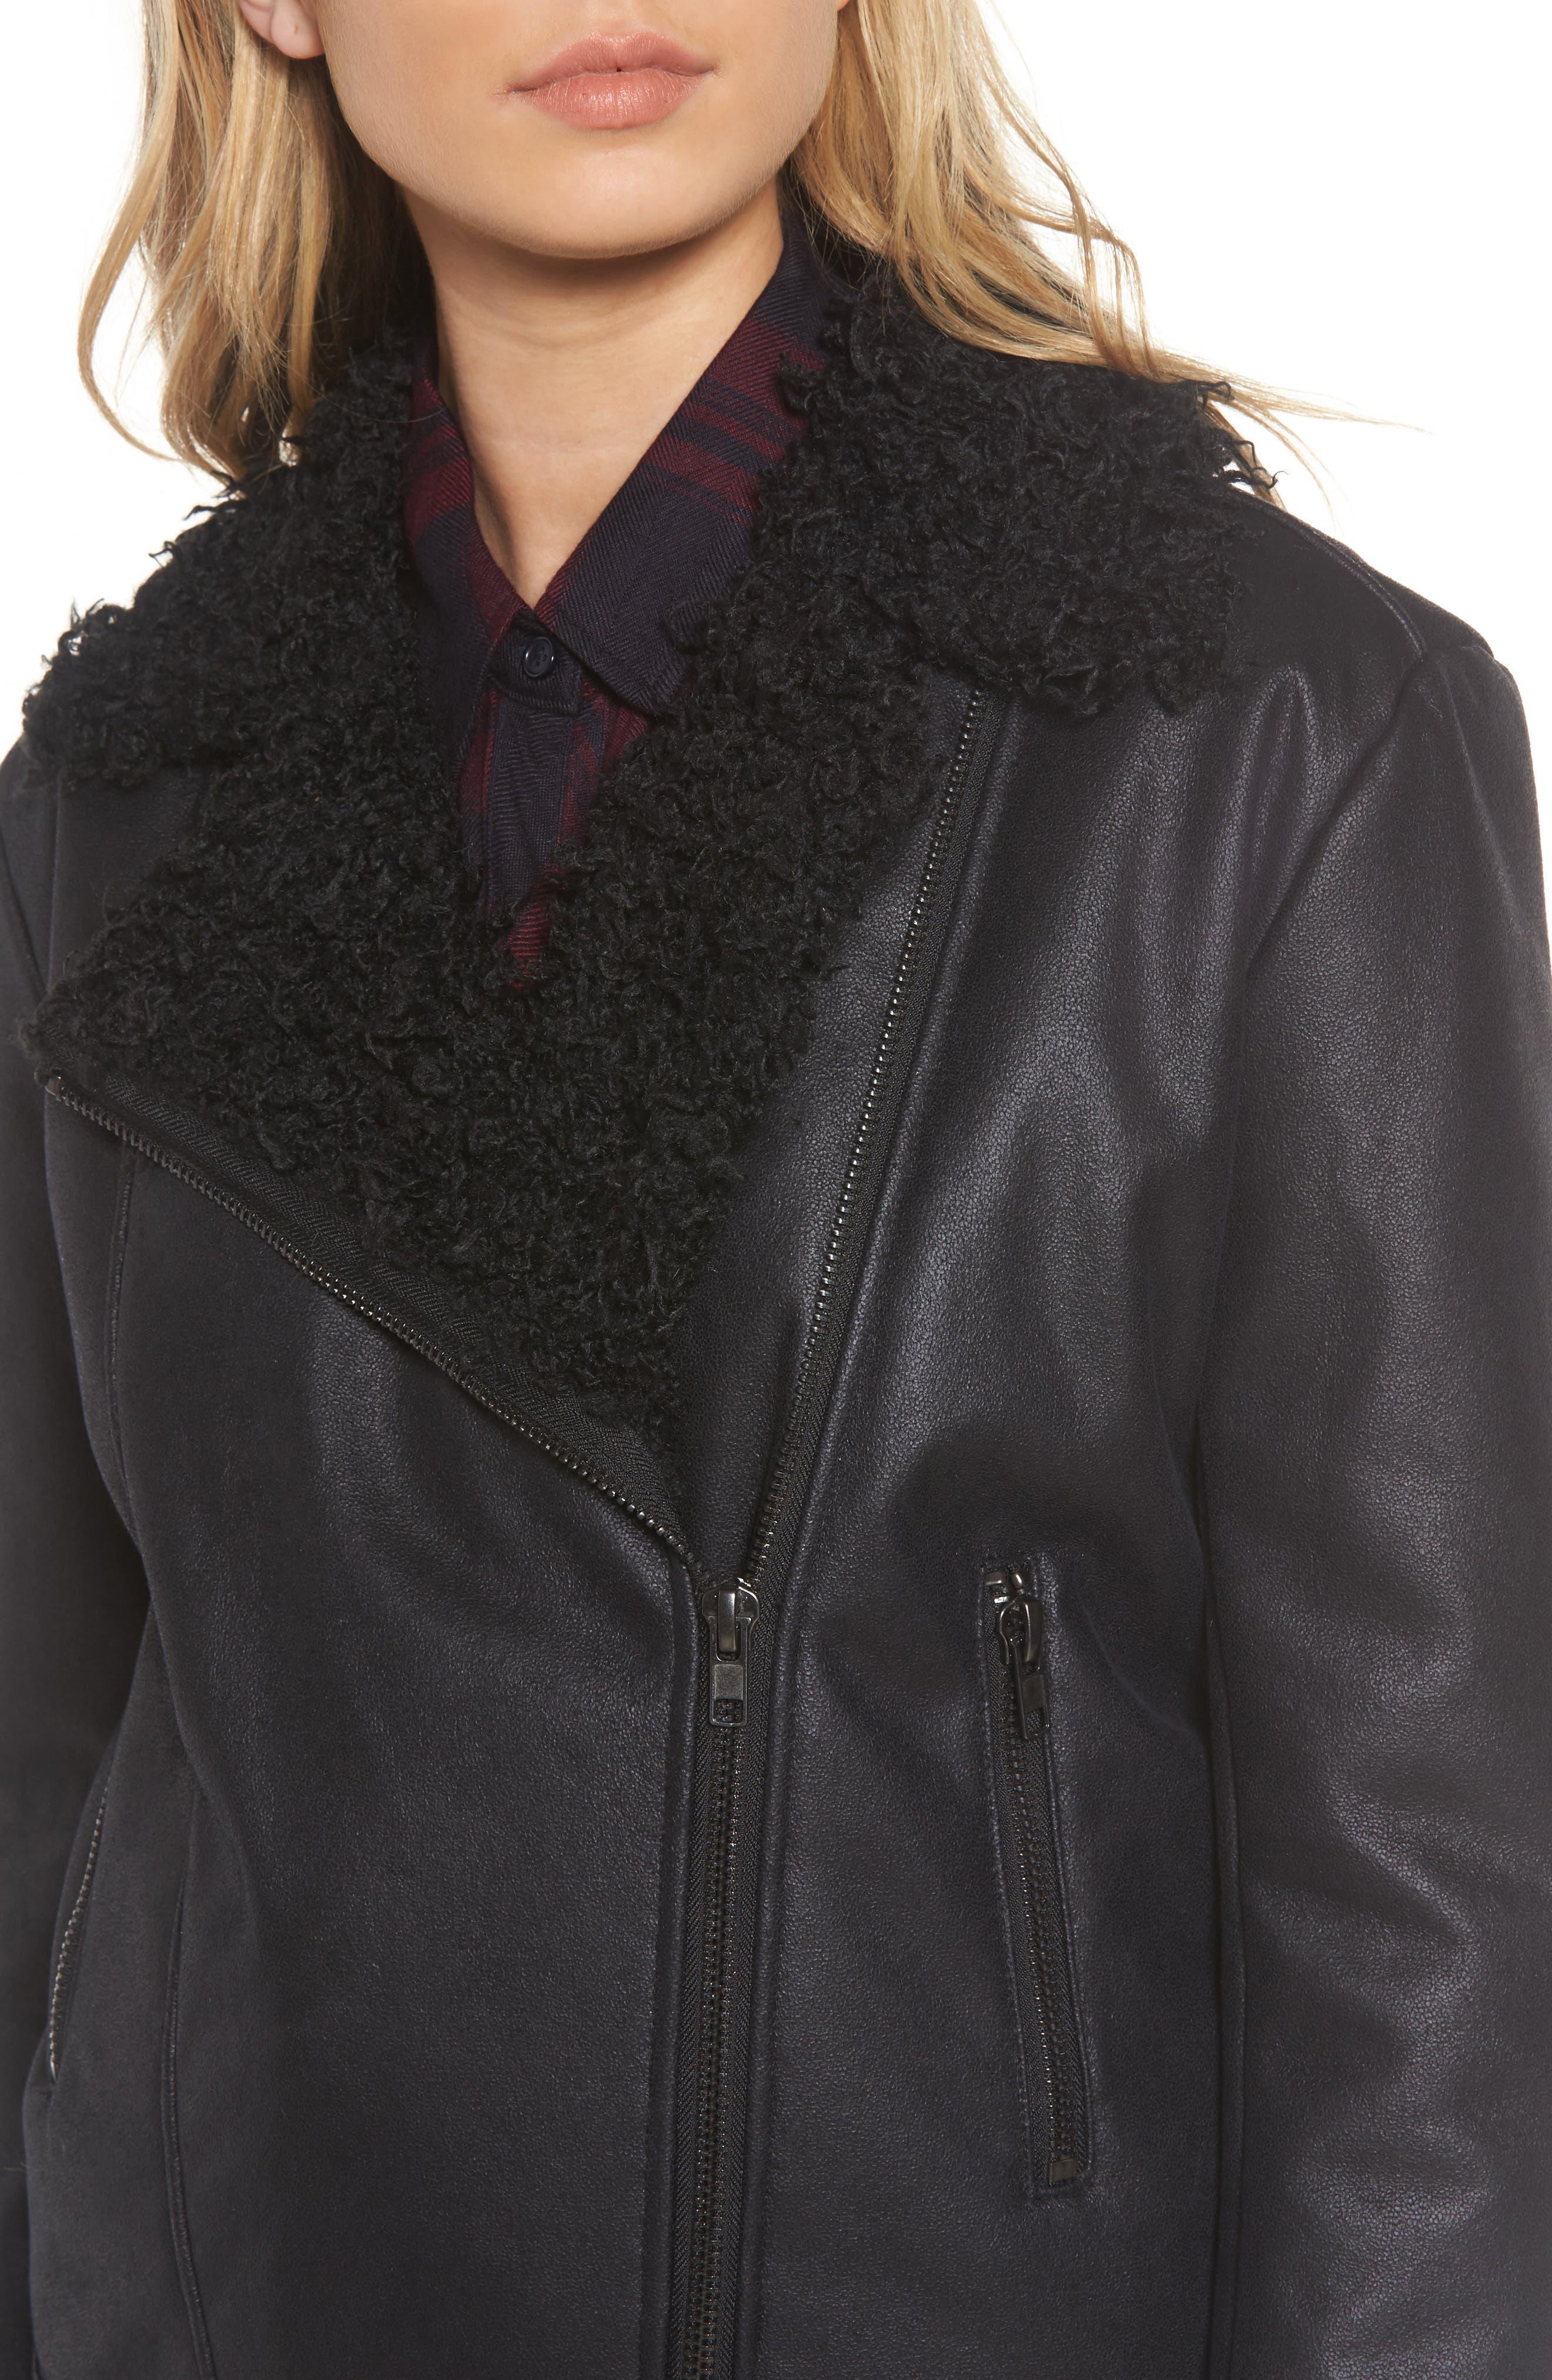 Bosworth Faux Shearling Jacket,                             Alternate thumbnail 4, color,                             001